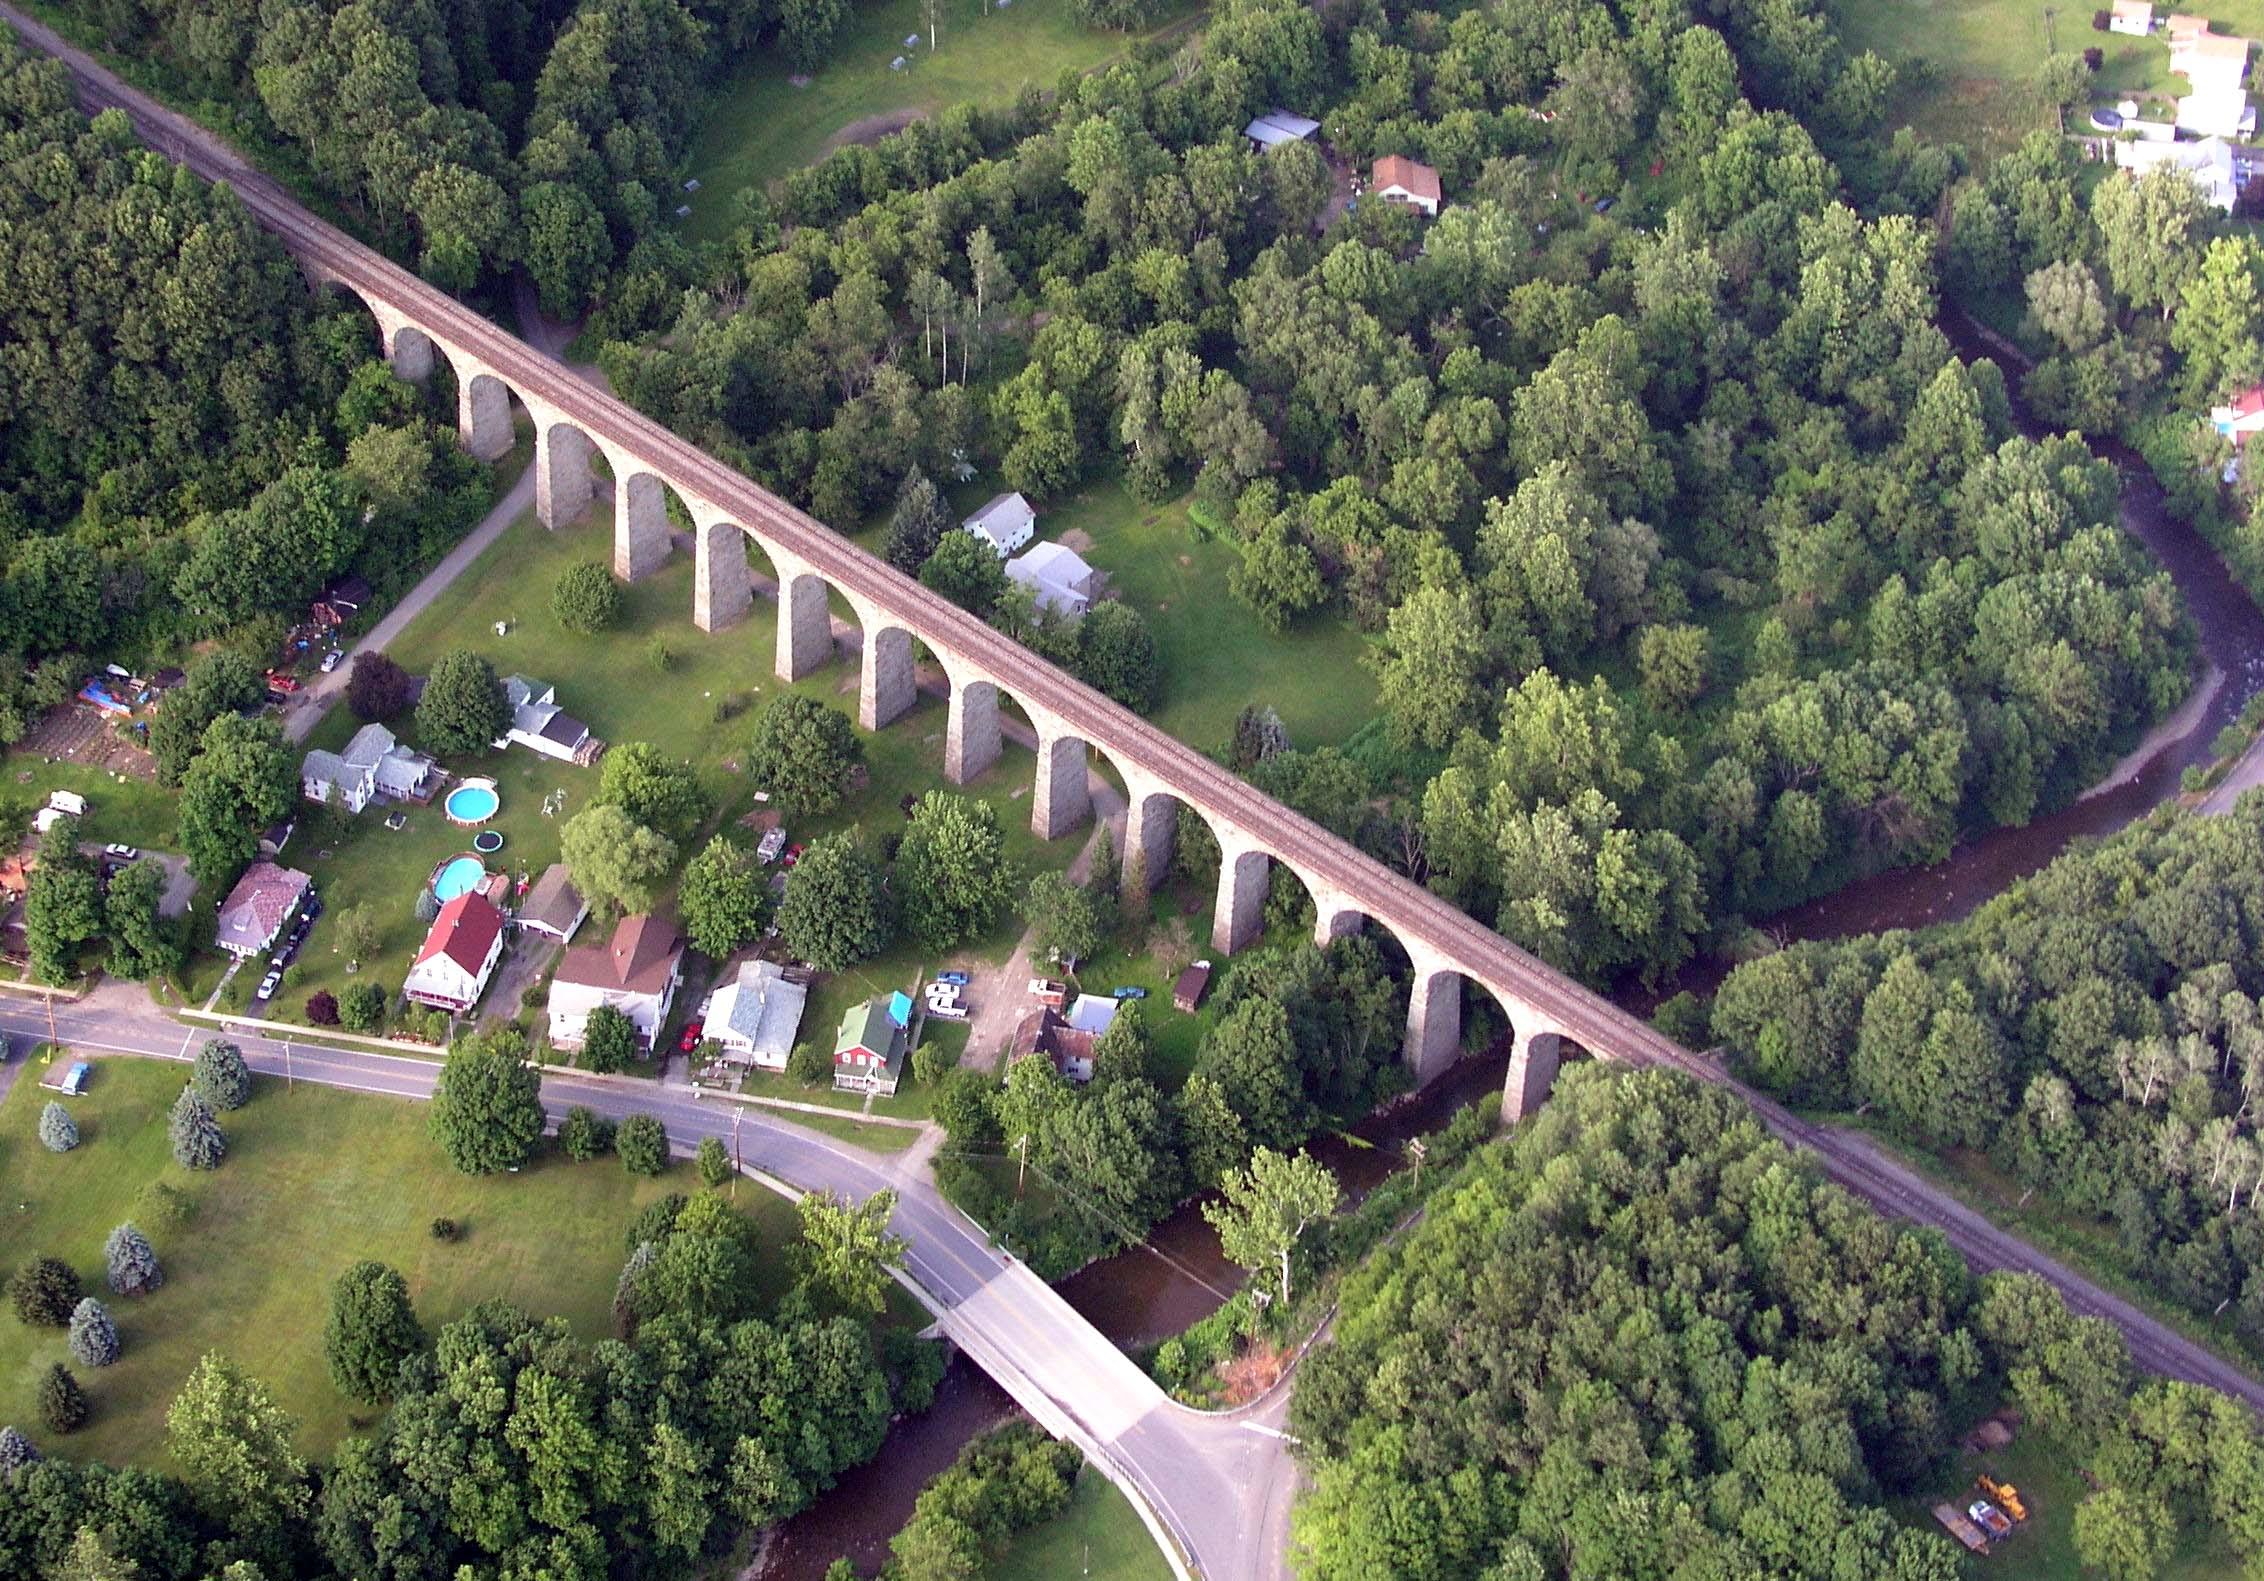 viaduct trail ultra marathon